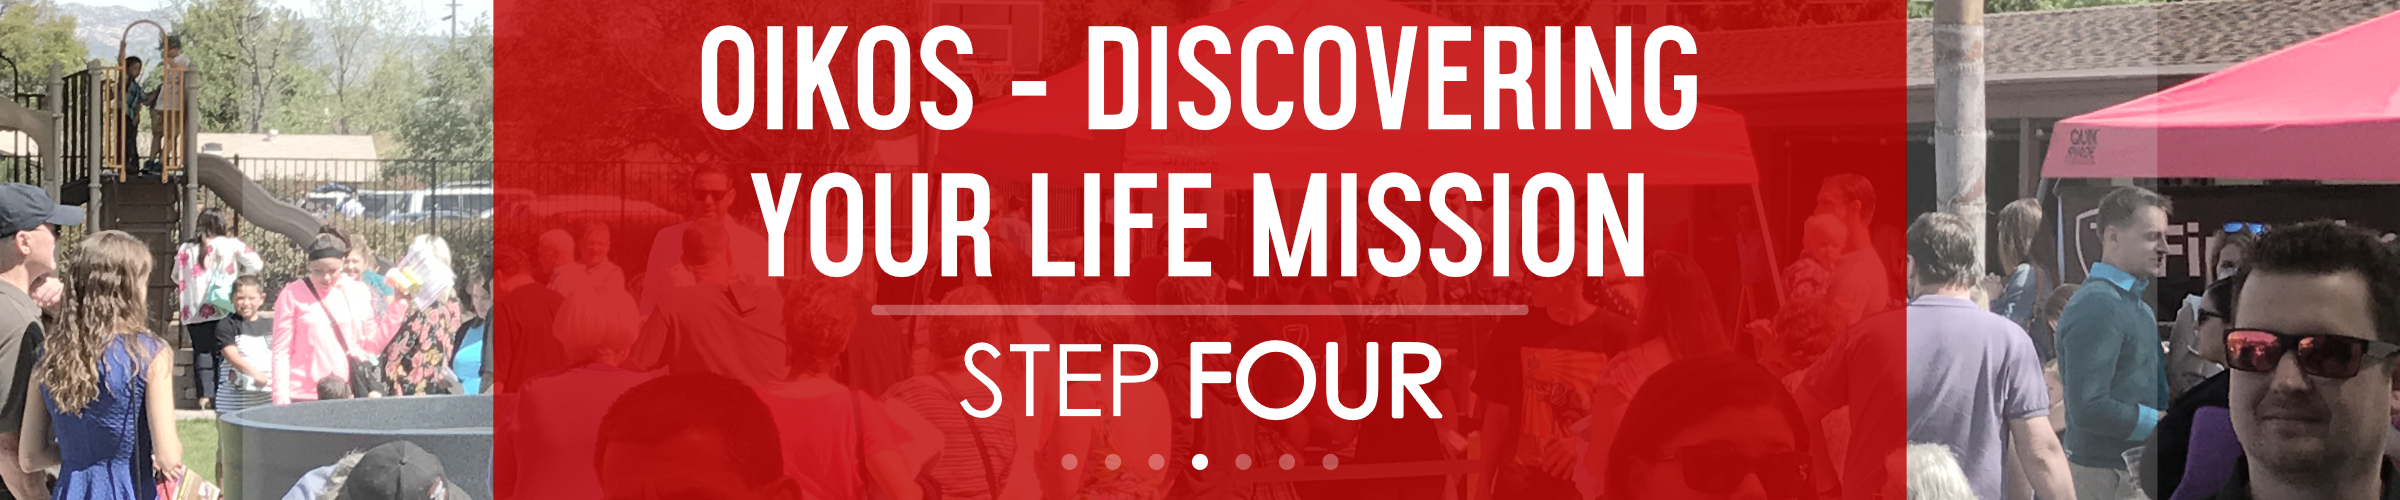 Life Mission - Step 4.jpg